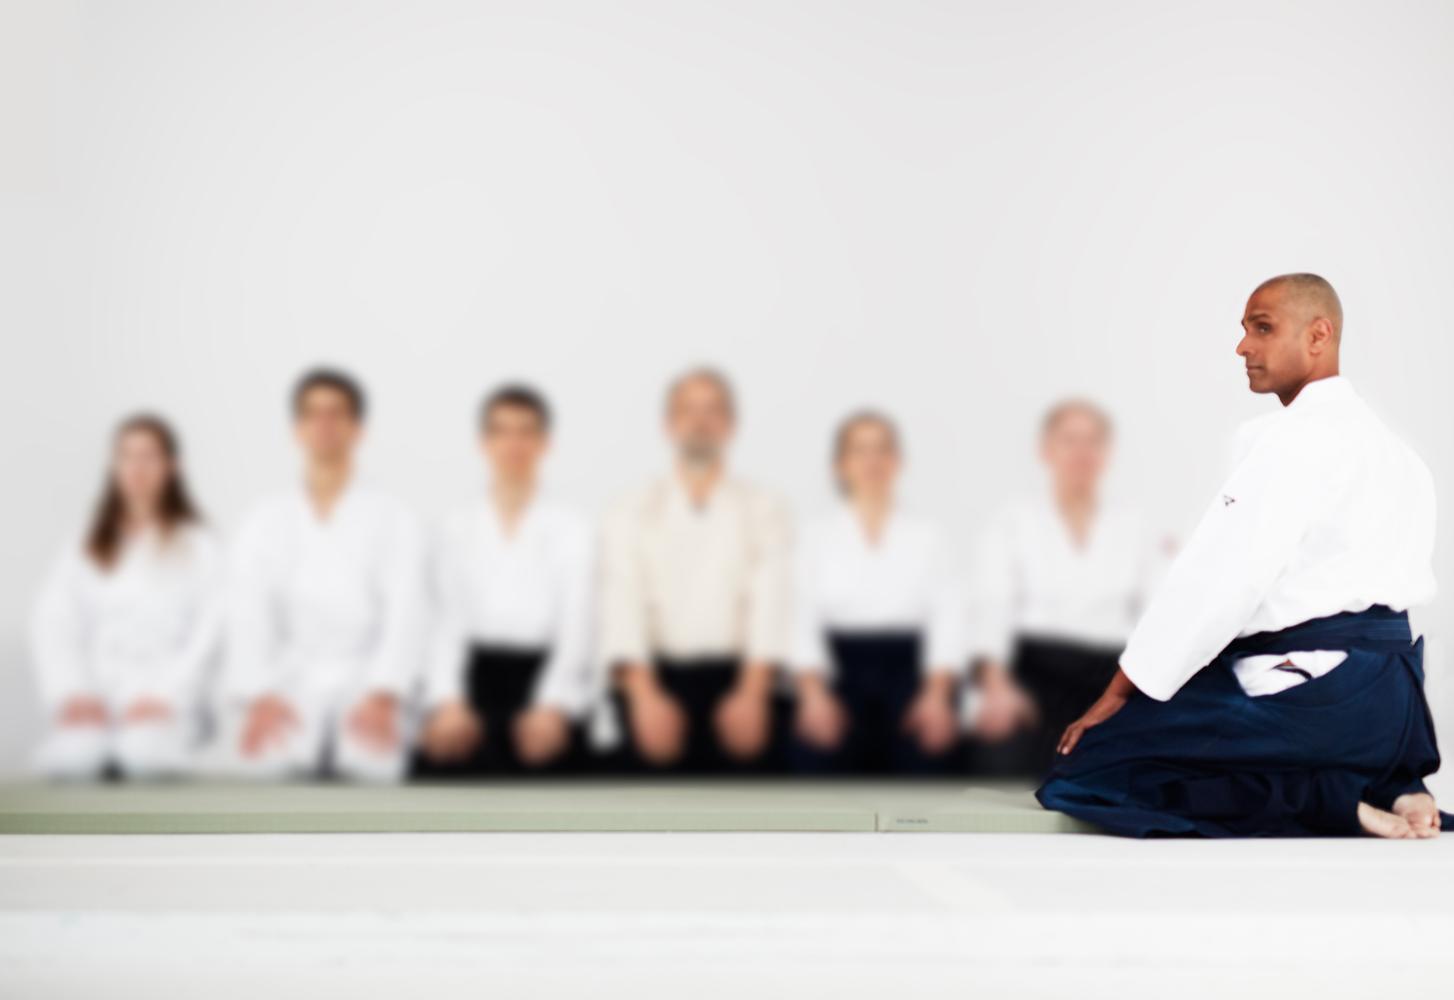 Ama Mann leads an Aikido class